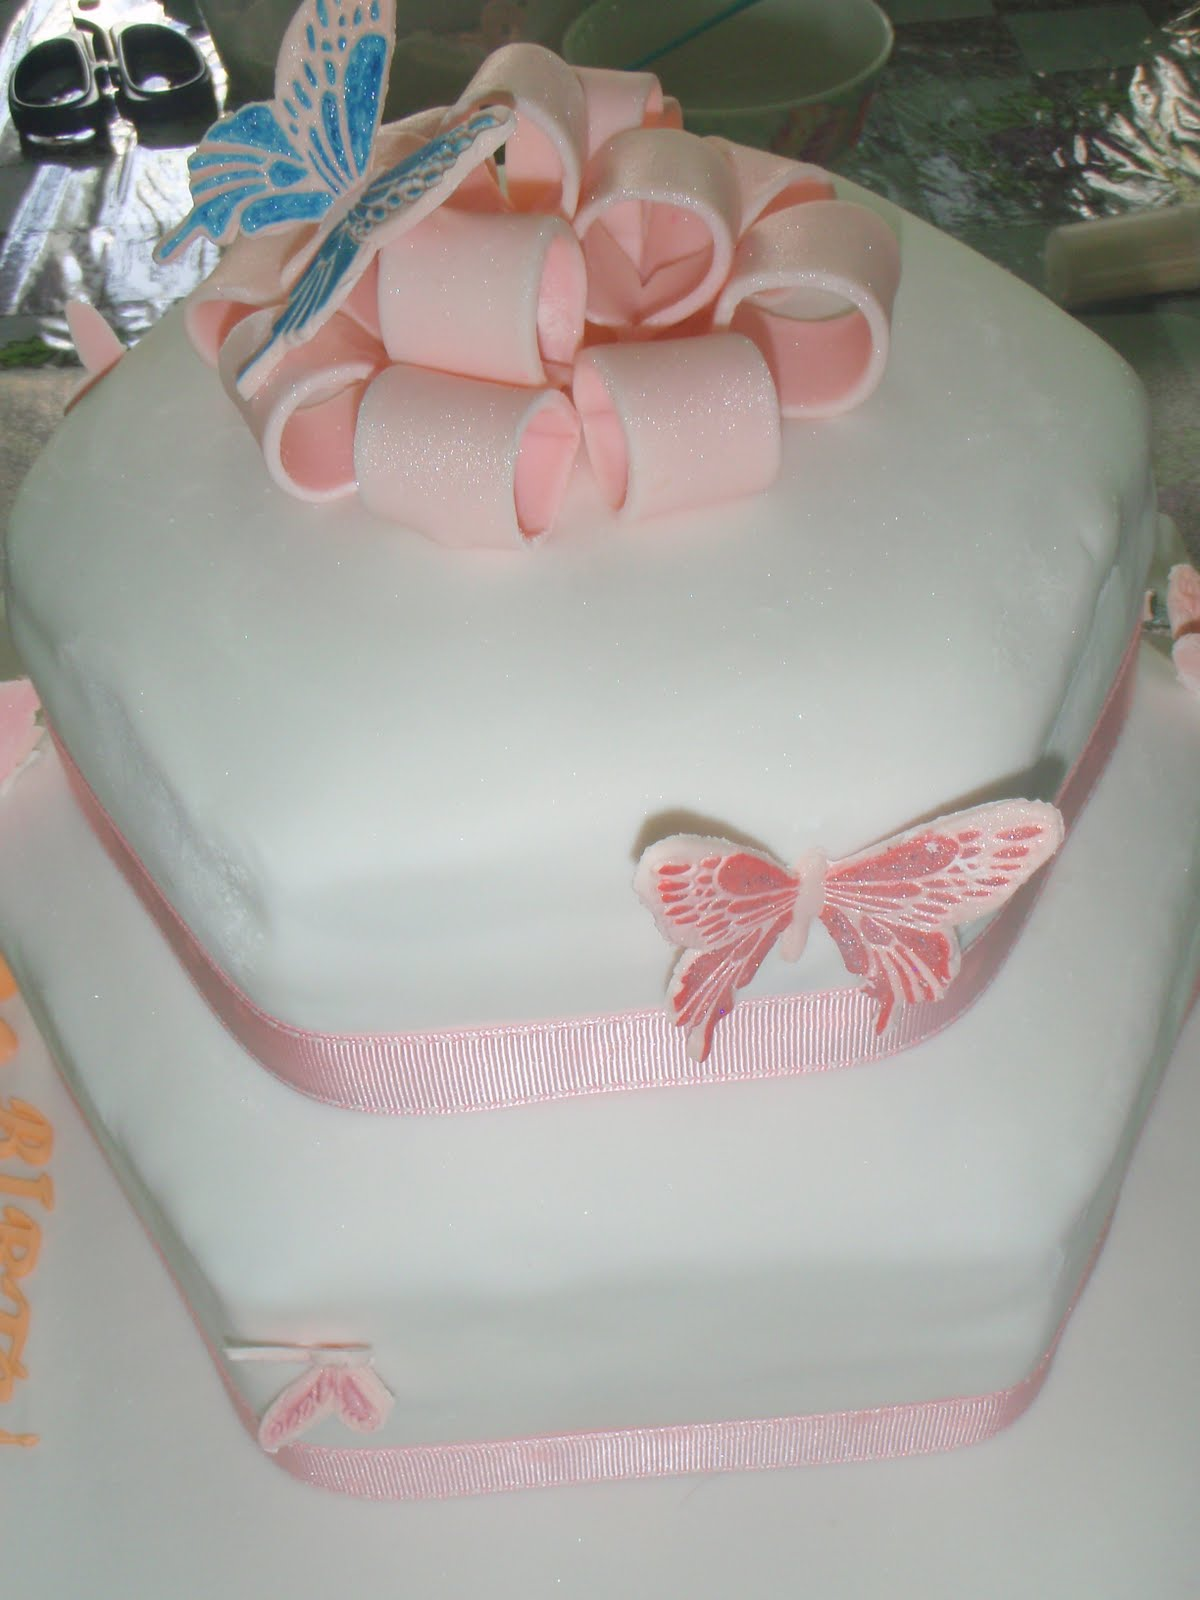 Eileen Creations Happy 21st Birthday To My Niece Xin Yi